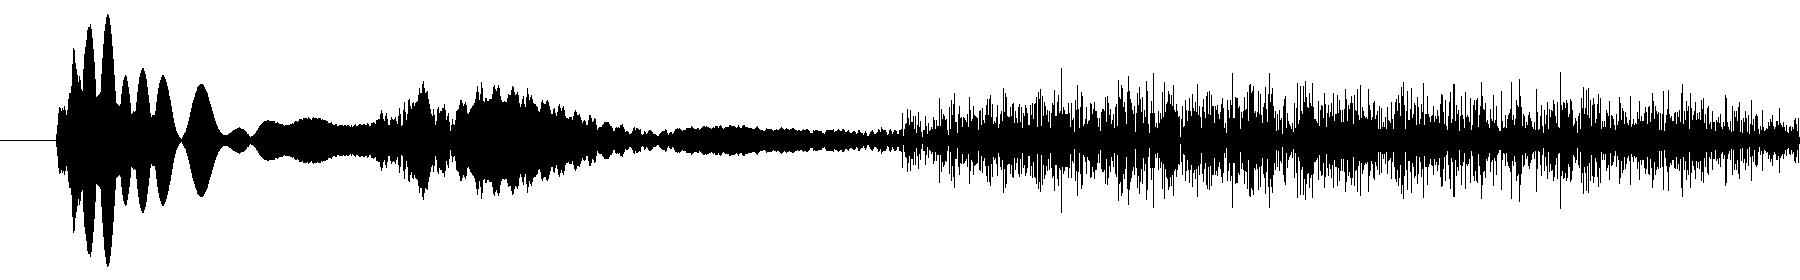 perc 1 47